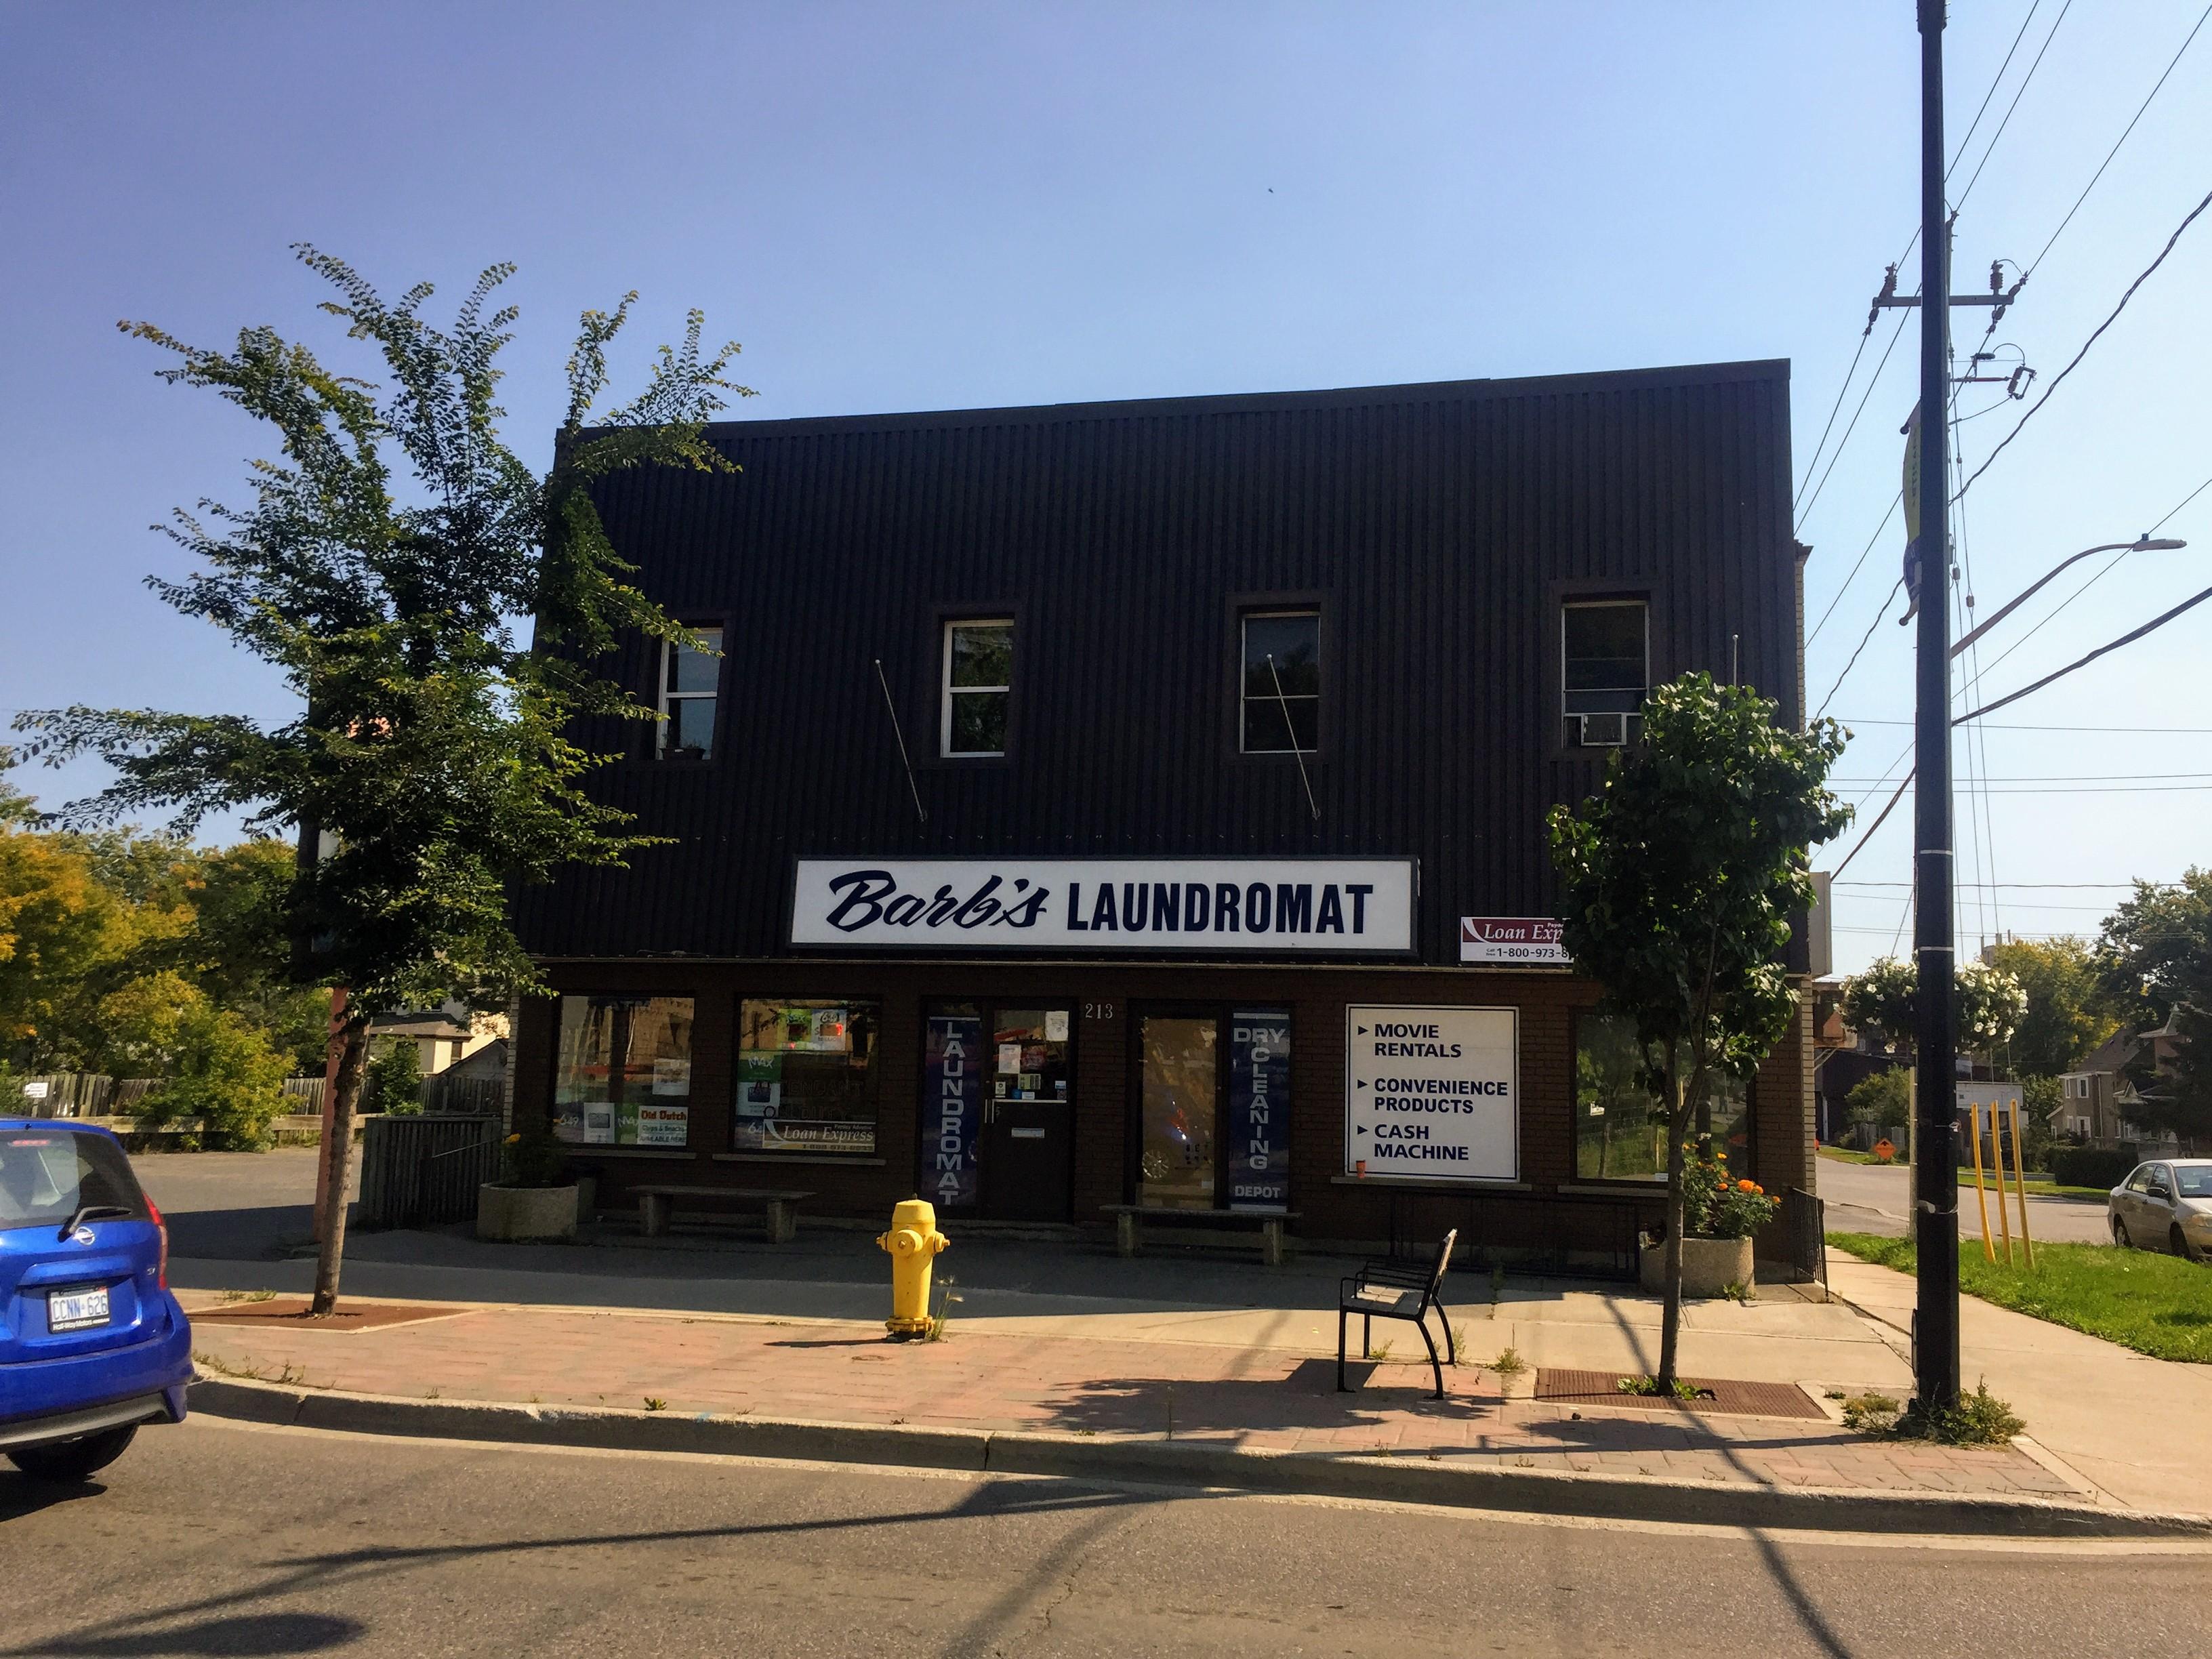 2017-09-10 Laundromat